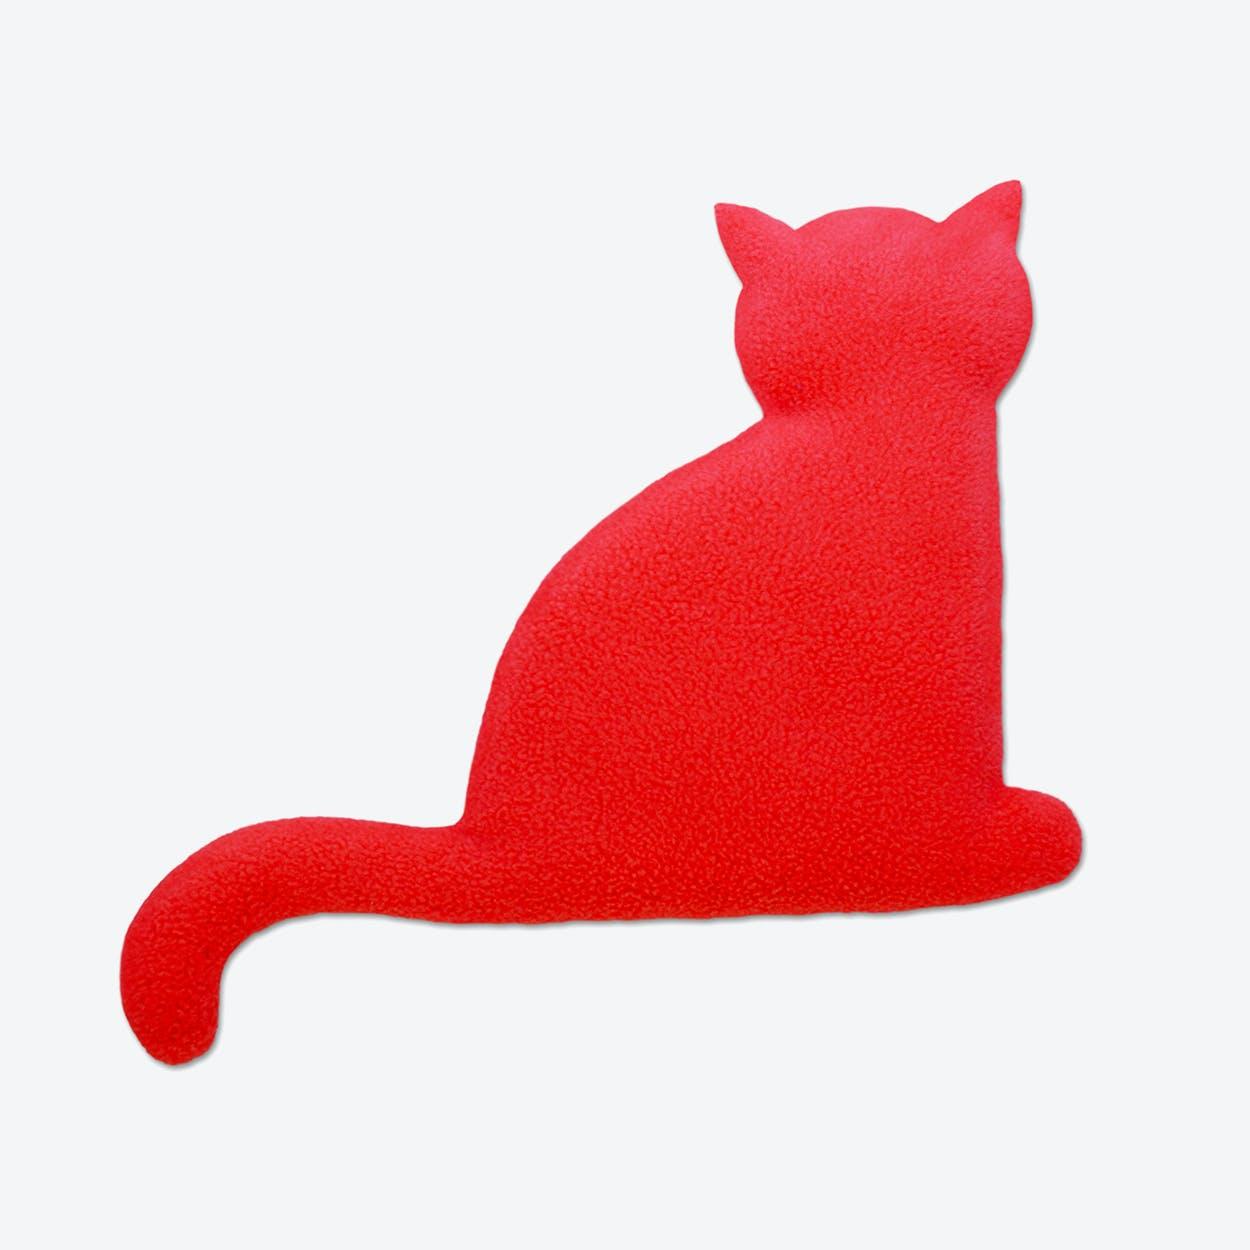 Warming Pillow, Minina The Cat, Sitting, Big in Red / Black